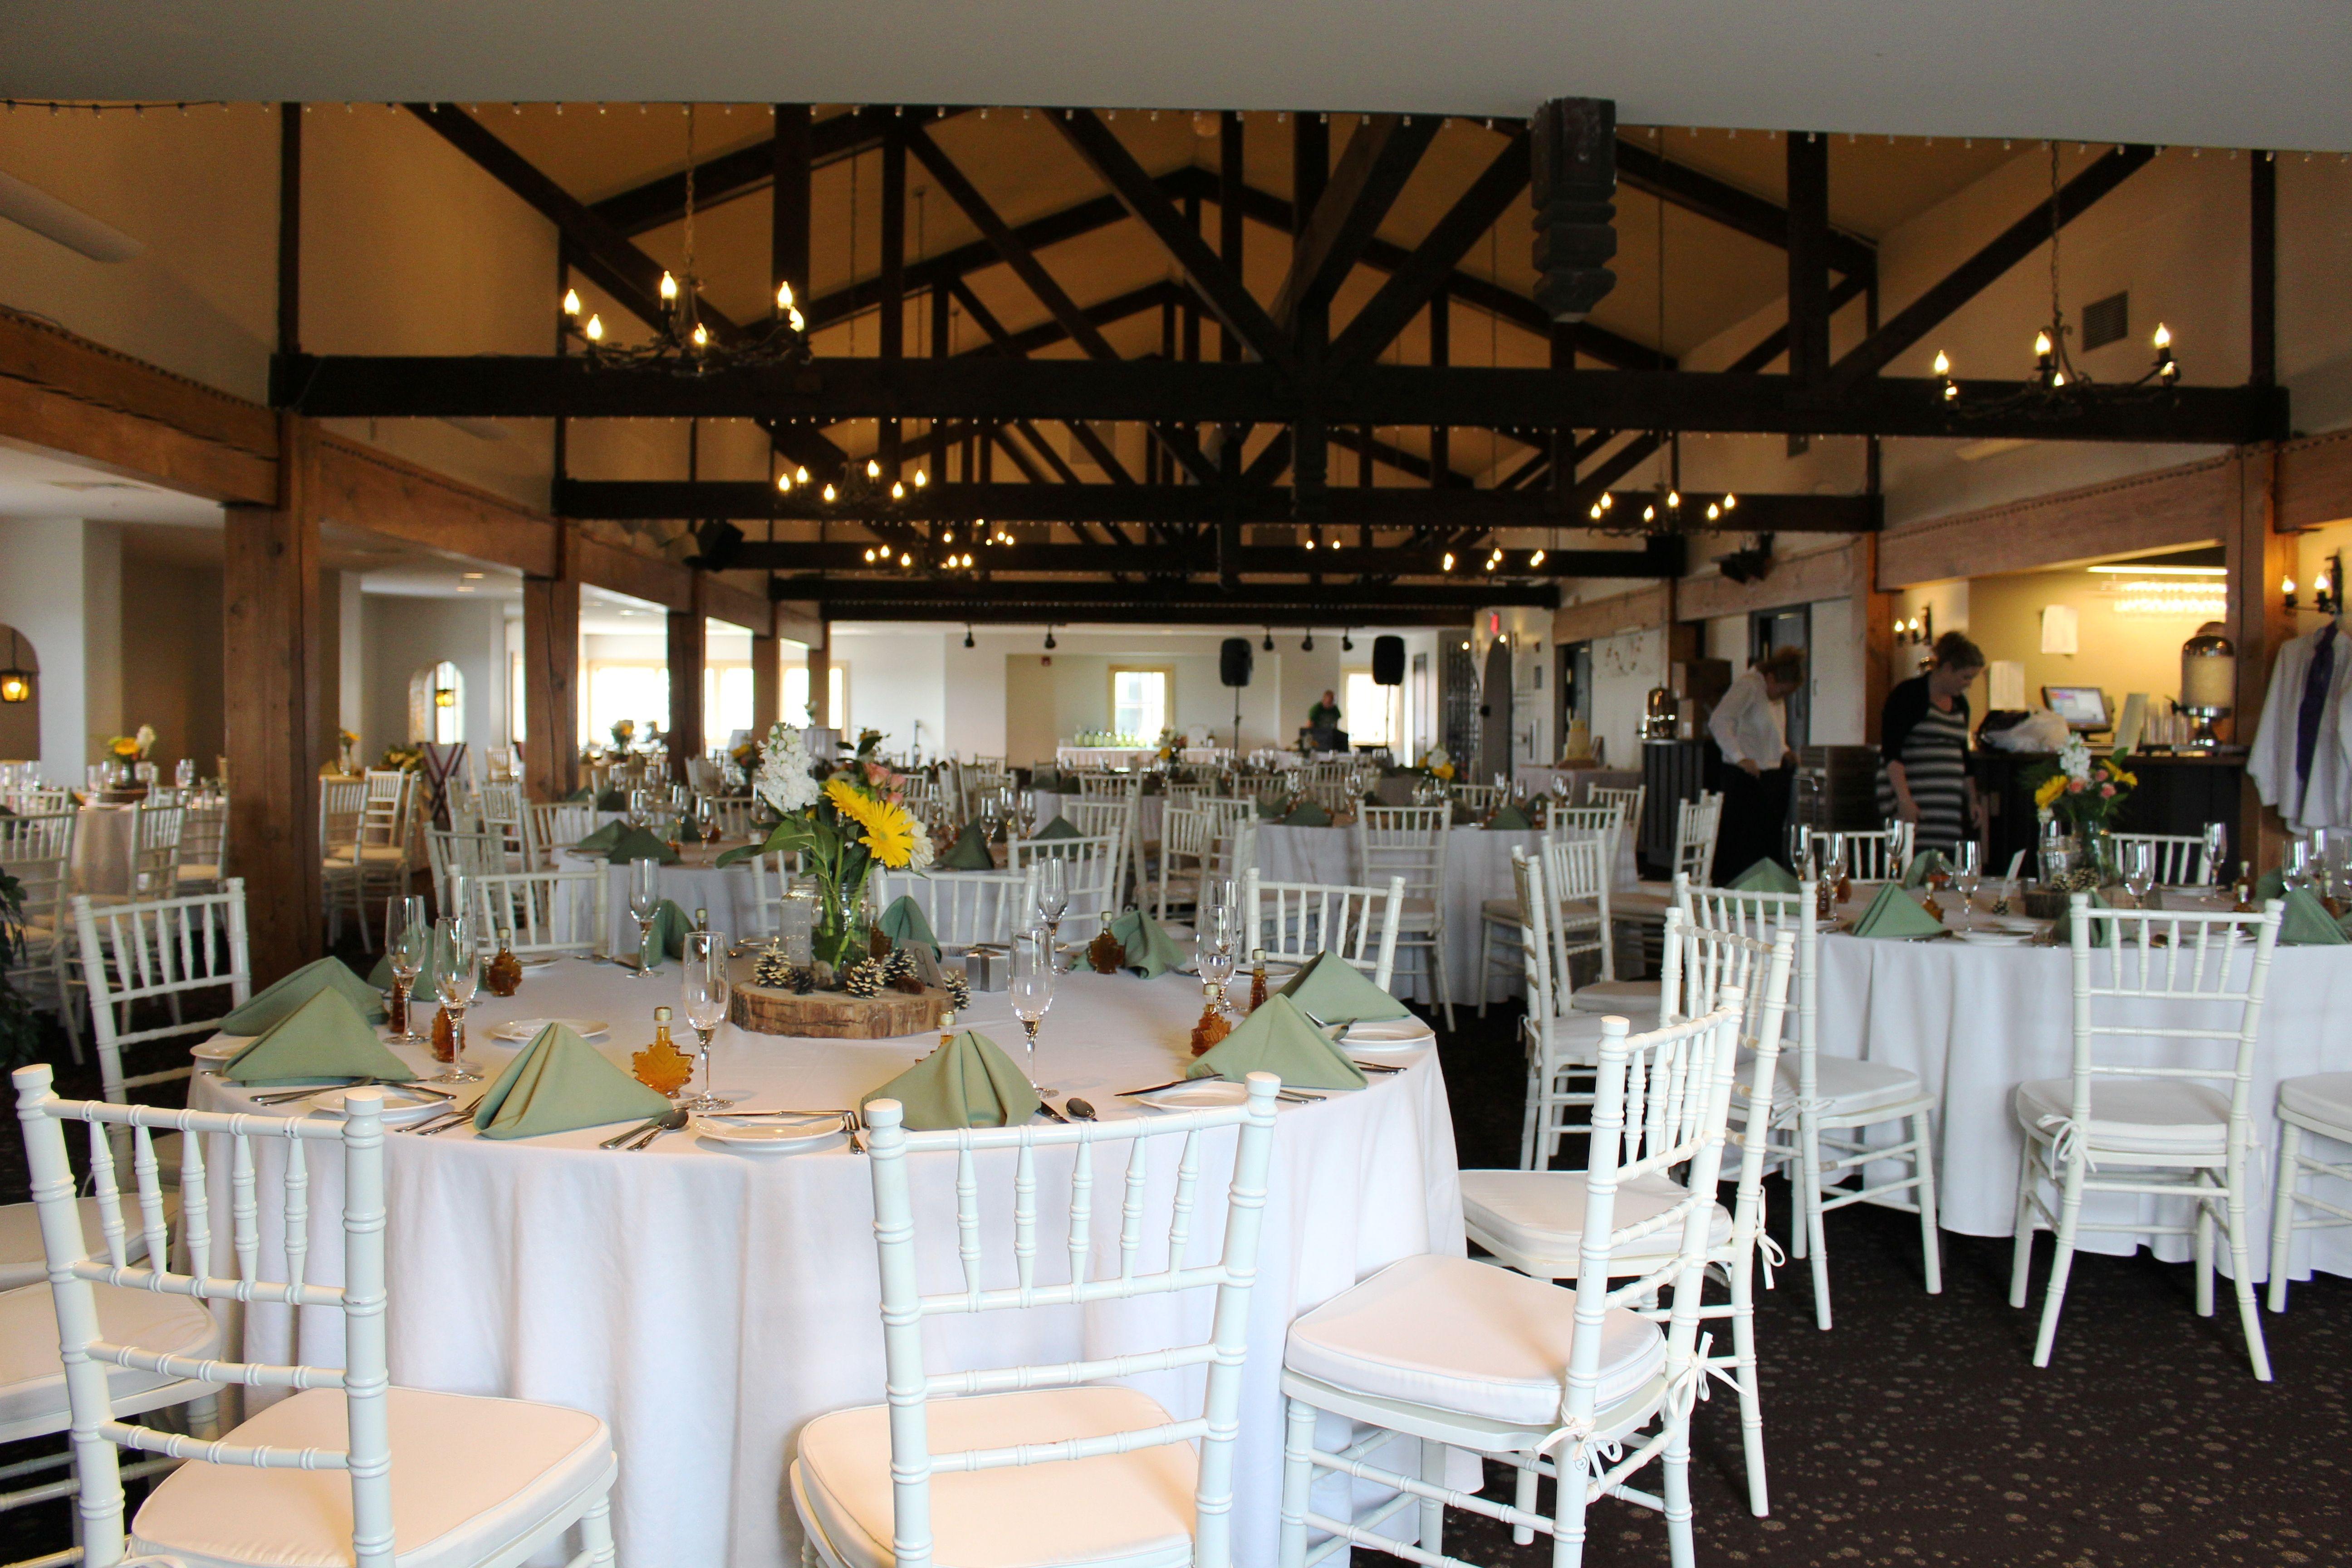 International Room Jay Peak Vermont Weddings Barn Wedding Venue Vermont Wedding Wedding